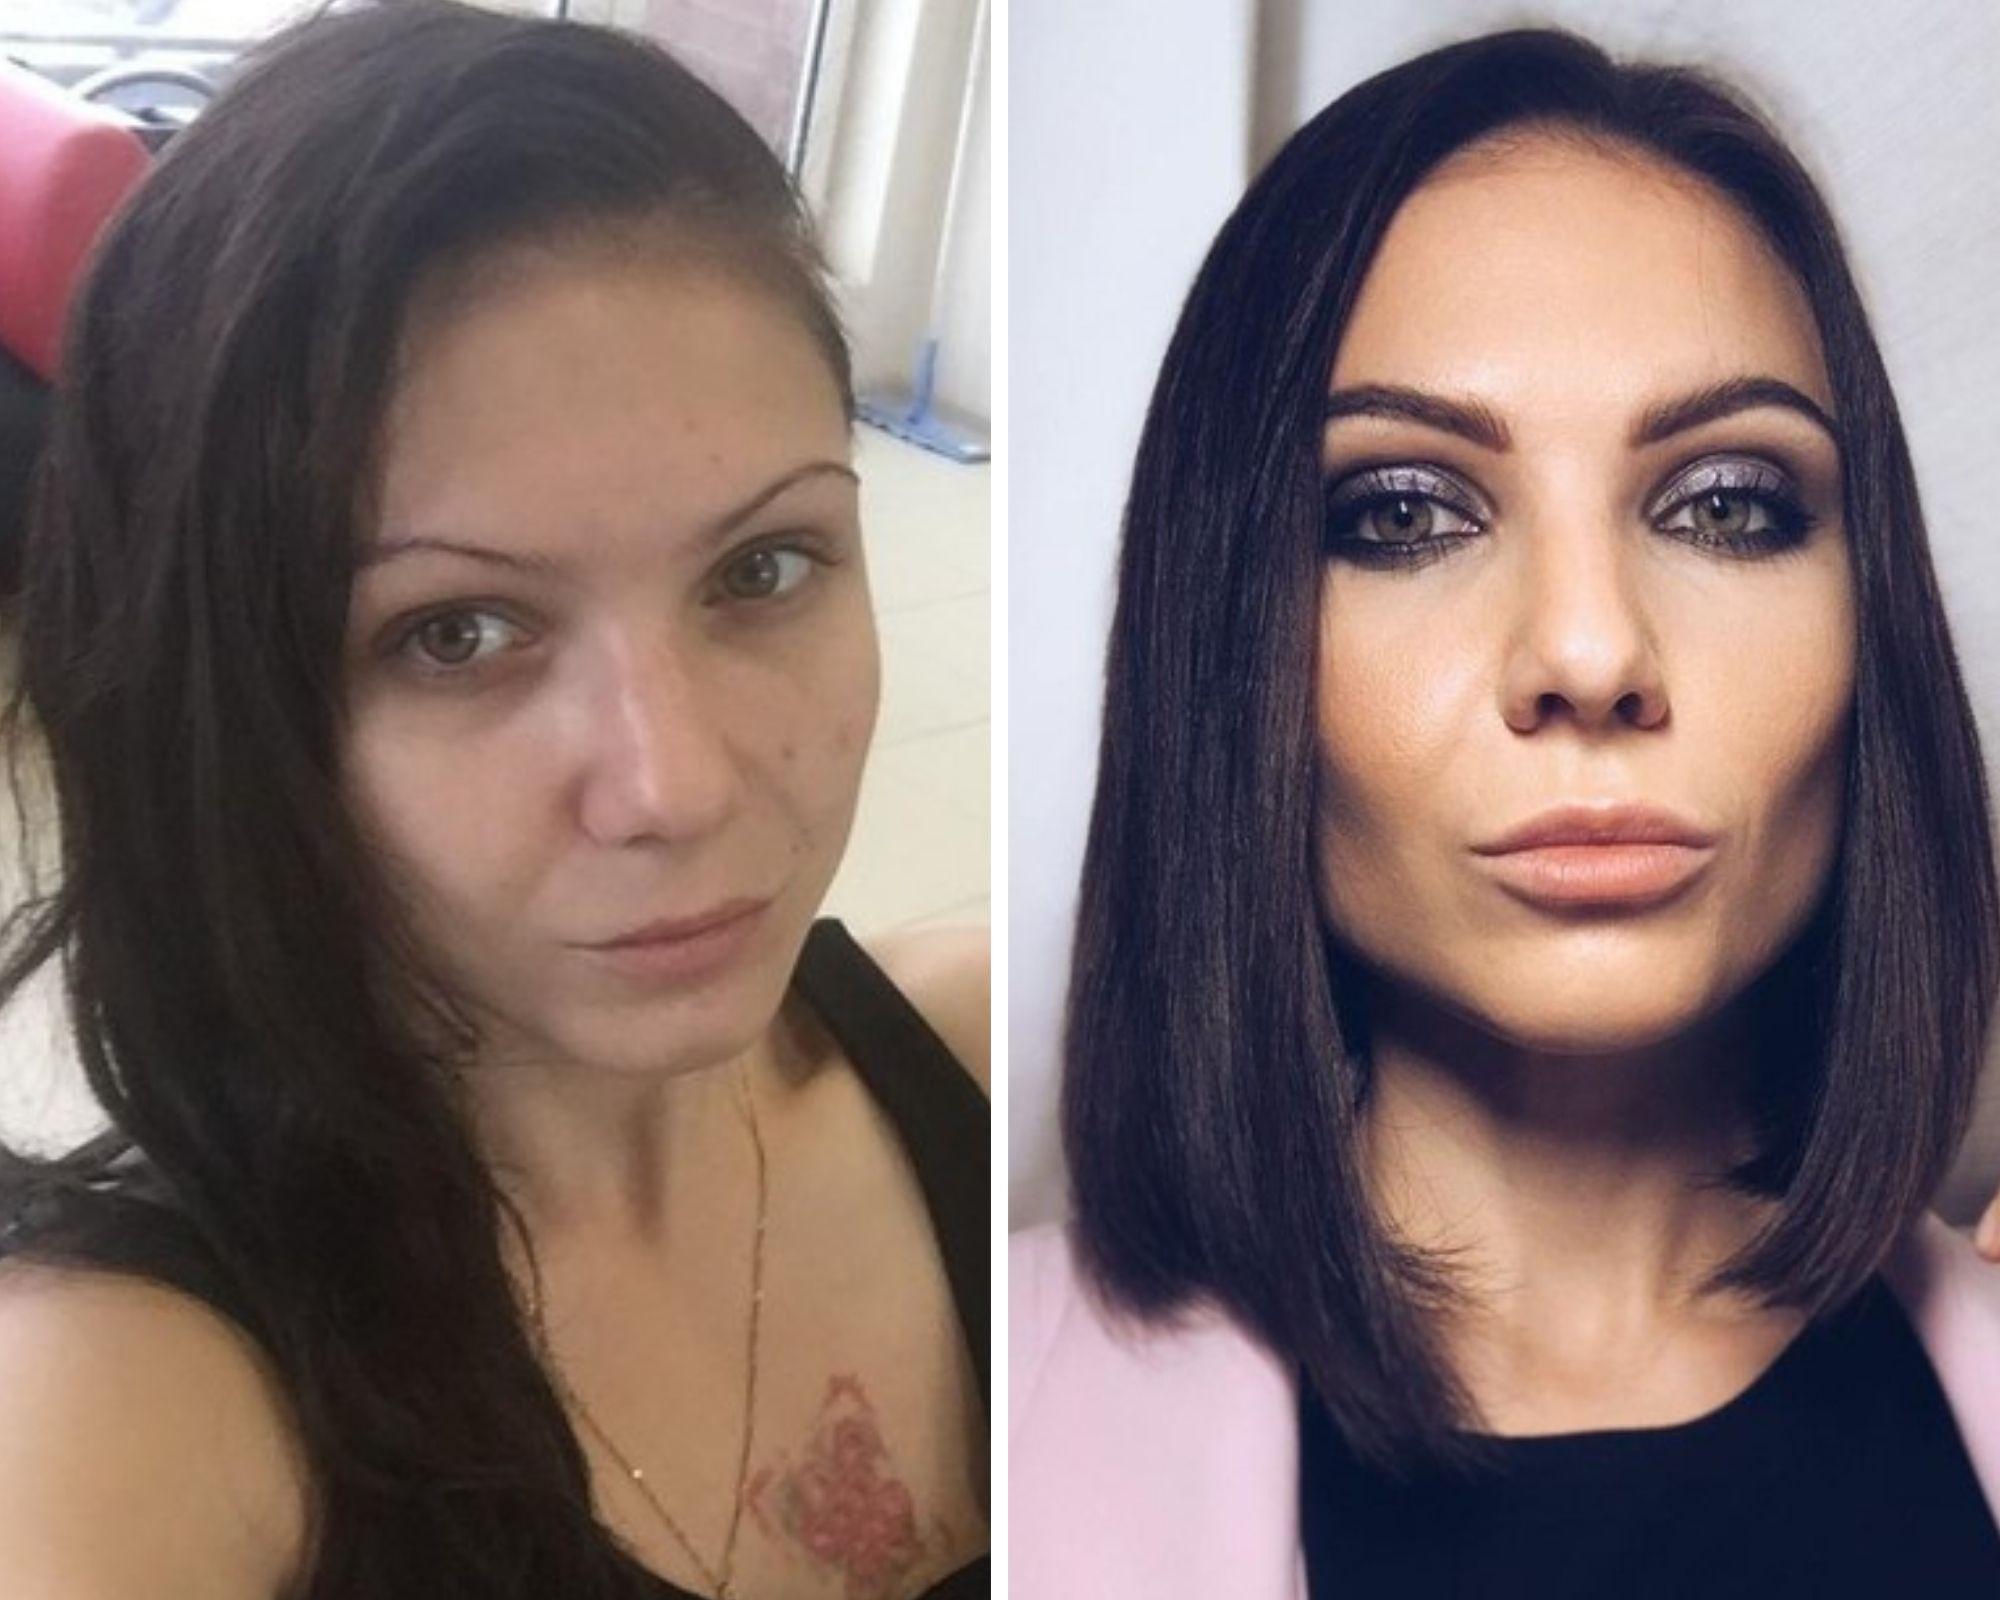 Яна до и после. Фото © Spid.center.ru